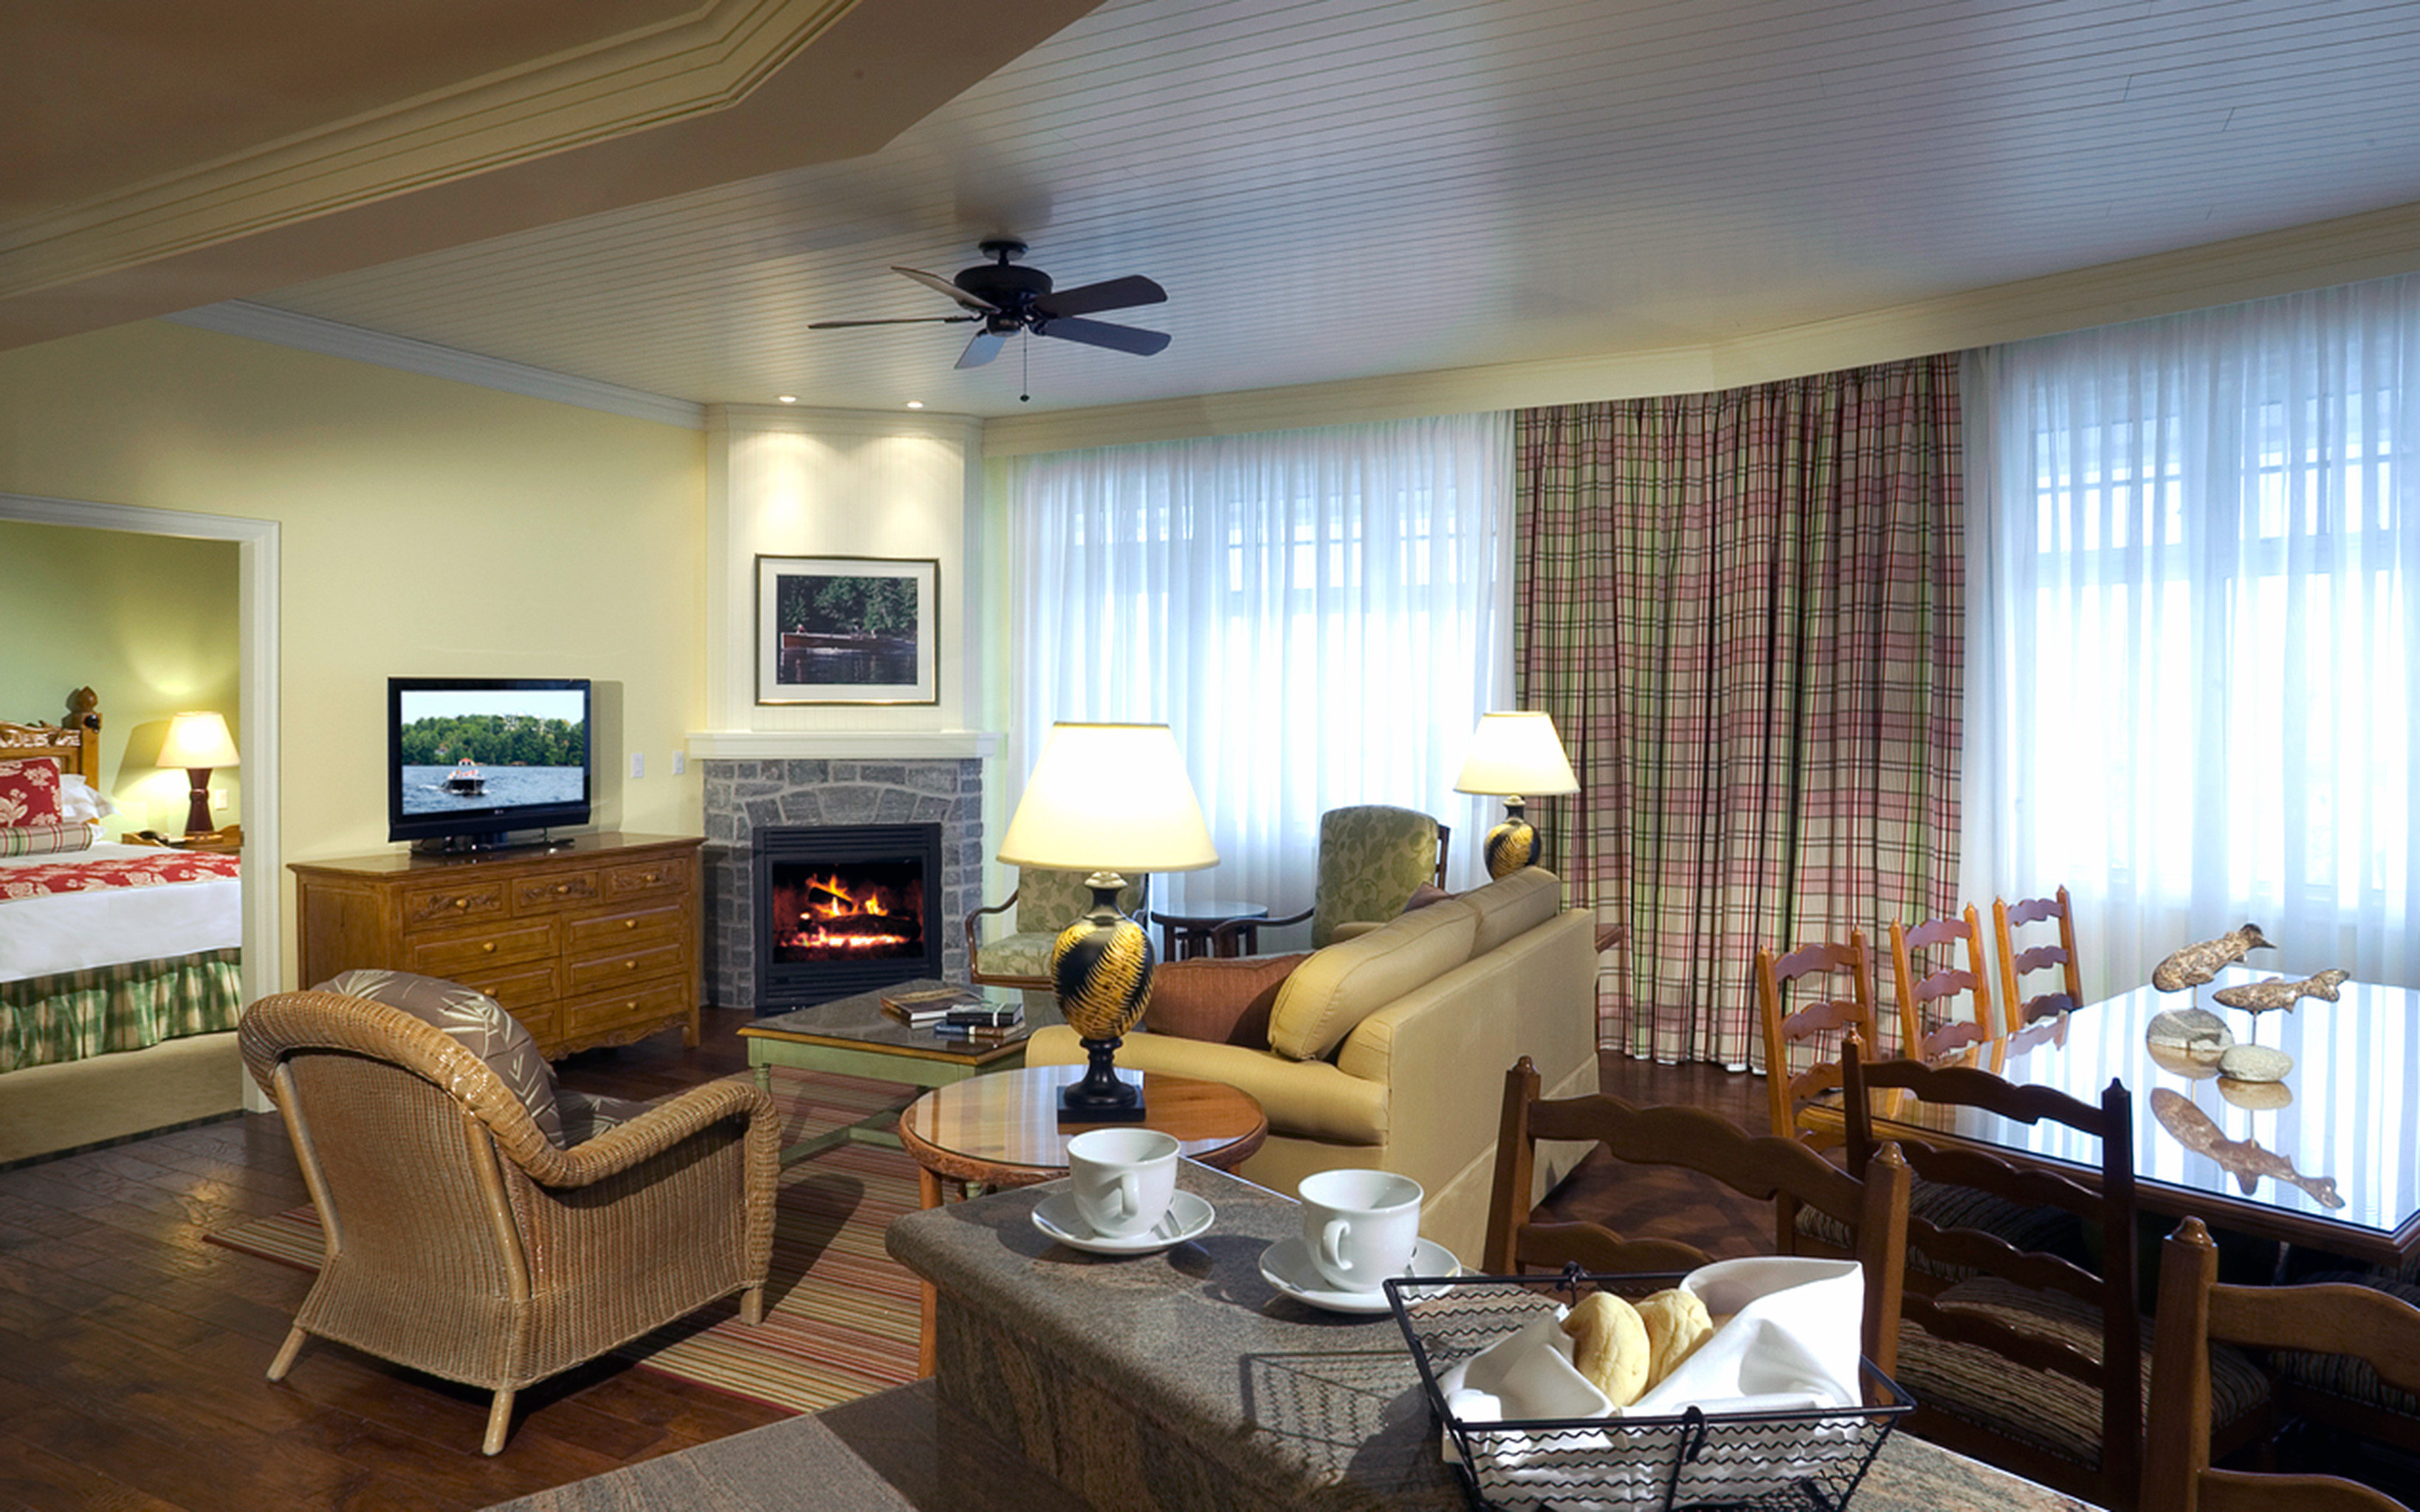 Bedroom Classic Fireplace Resort sofa property living room home condominium Suite cottage Villa flat leather